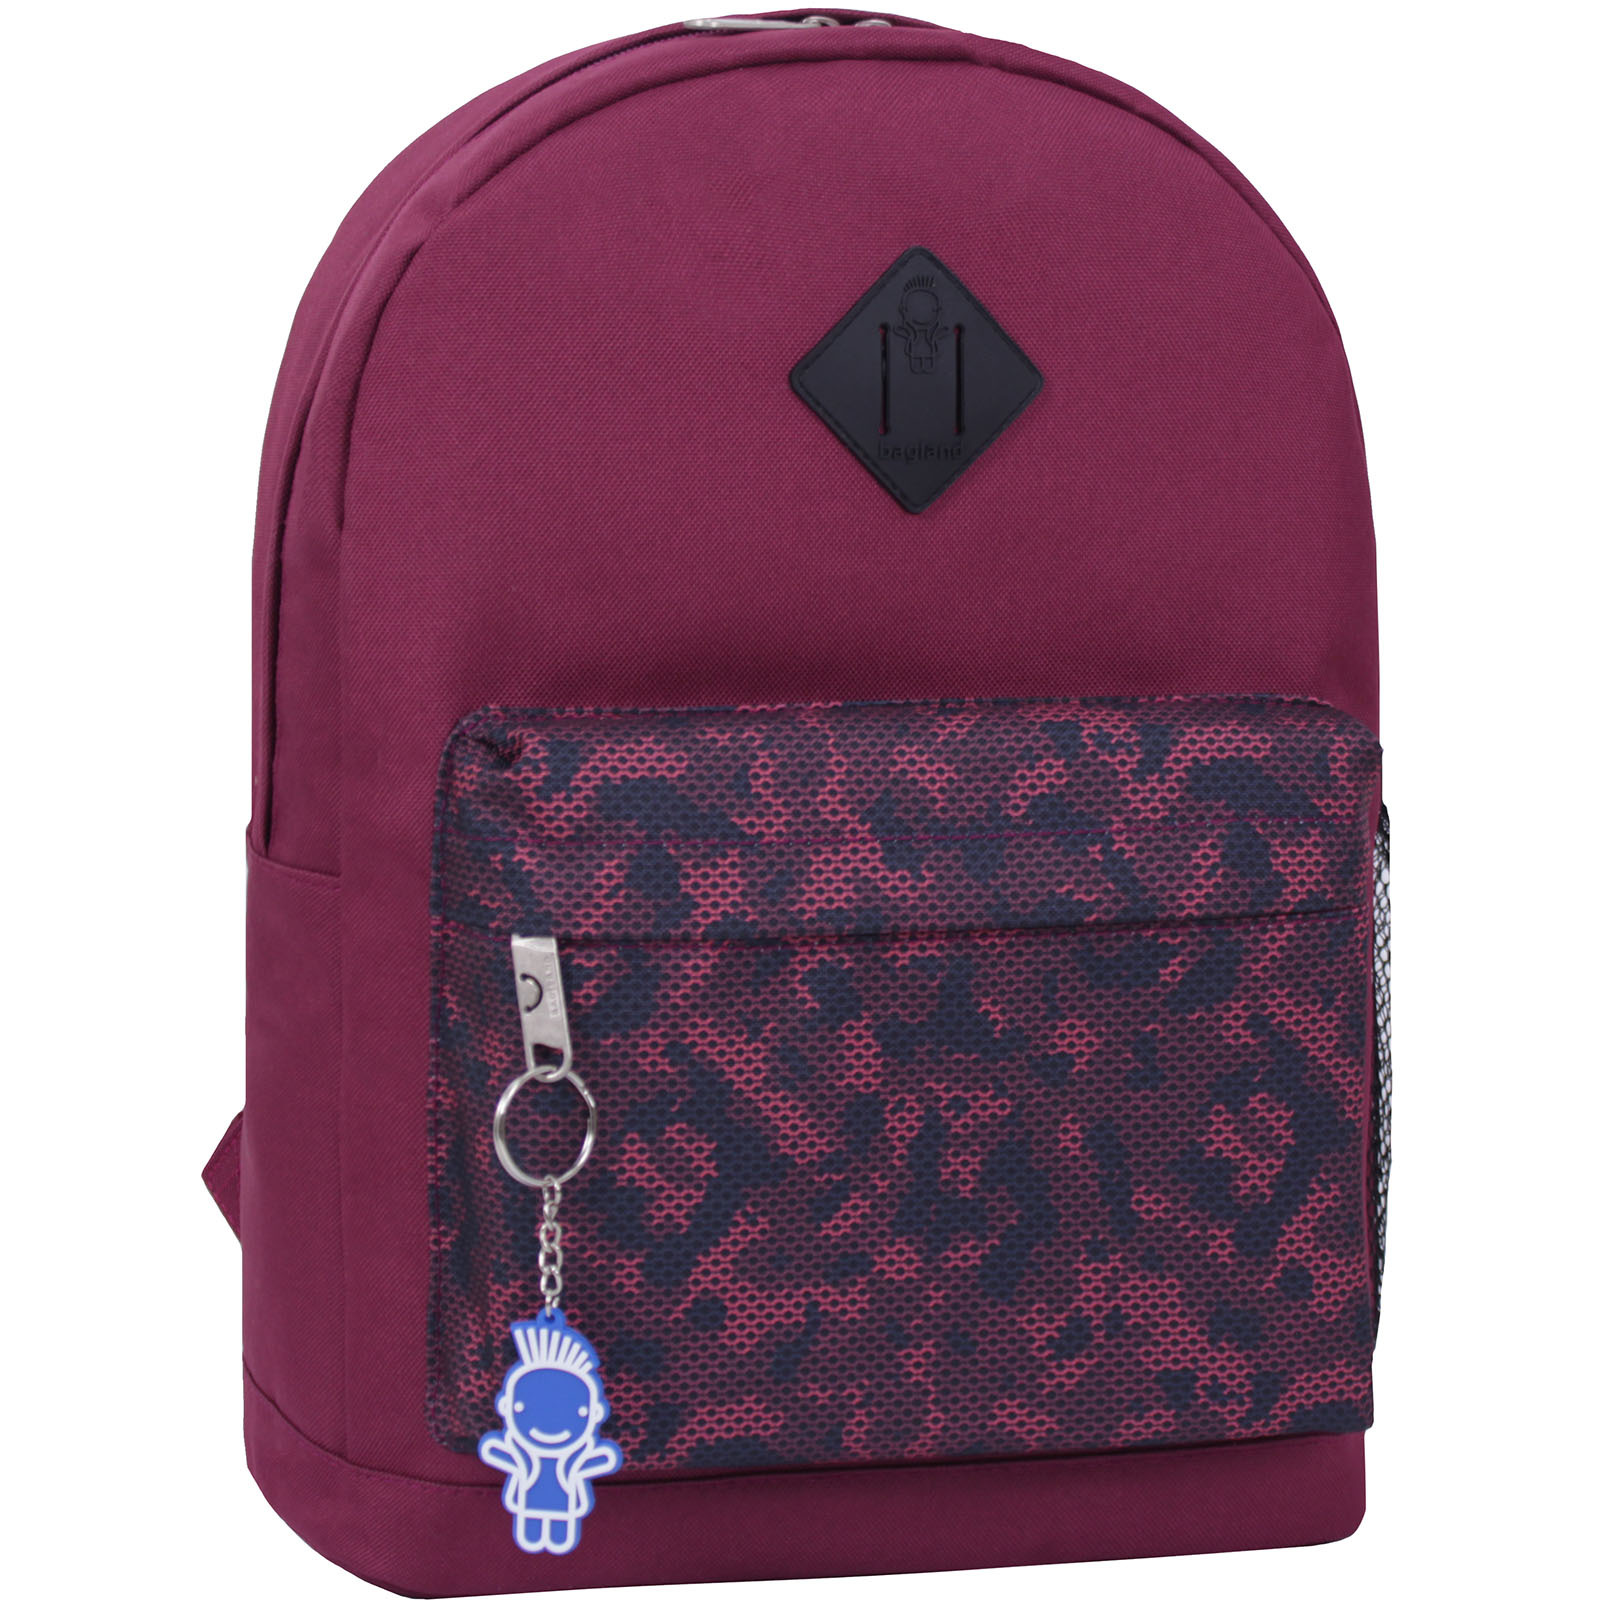 Городские рюкзаки Рюкзак Bagland Молодежный W/R 17 л. вишня 466 (00533662) IMG_2239_суб.466_.JPG